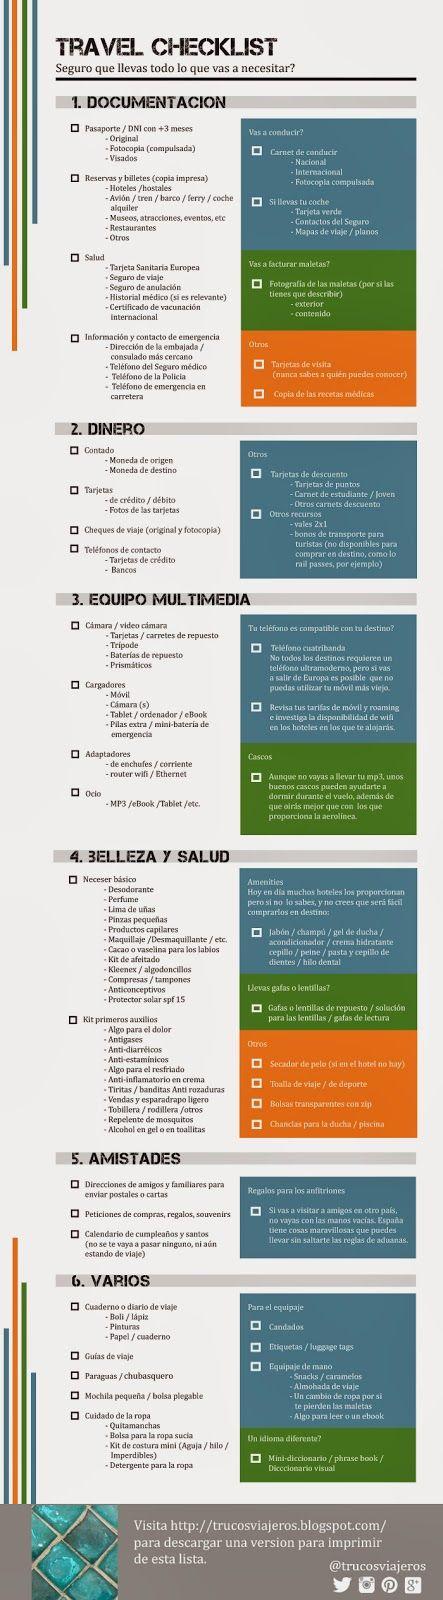 Infografia, imprescindibles para la maleta. Travel checklist infographic. #viajar Tambien en #pdf